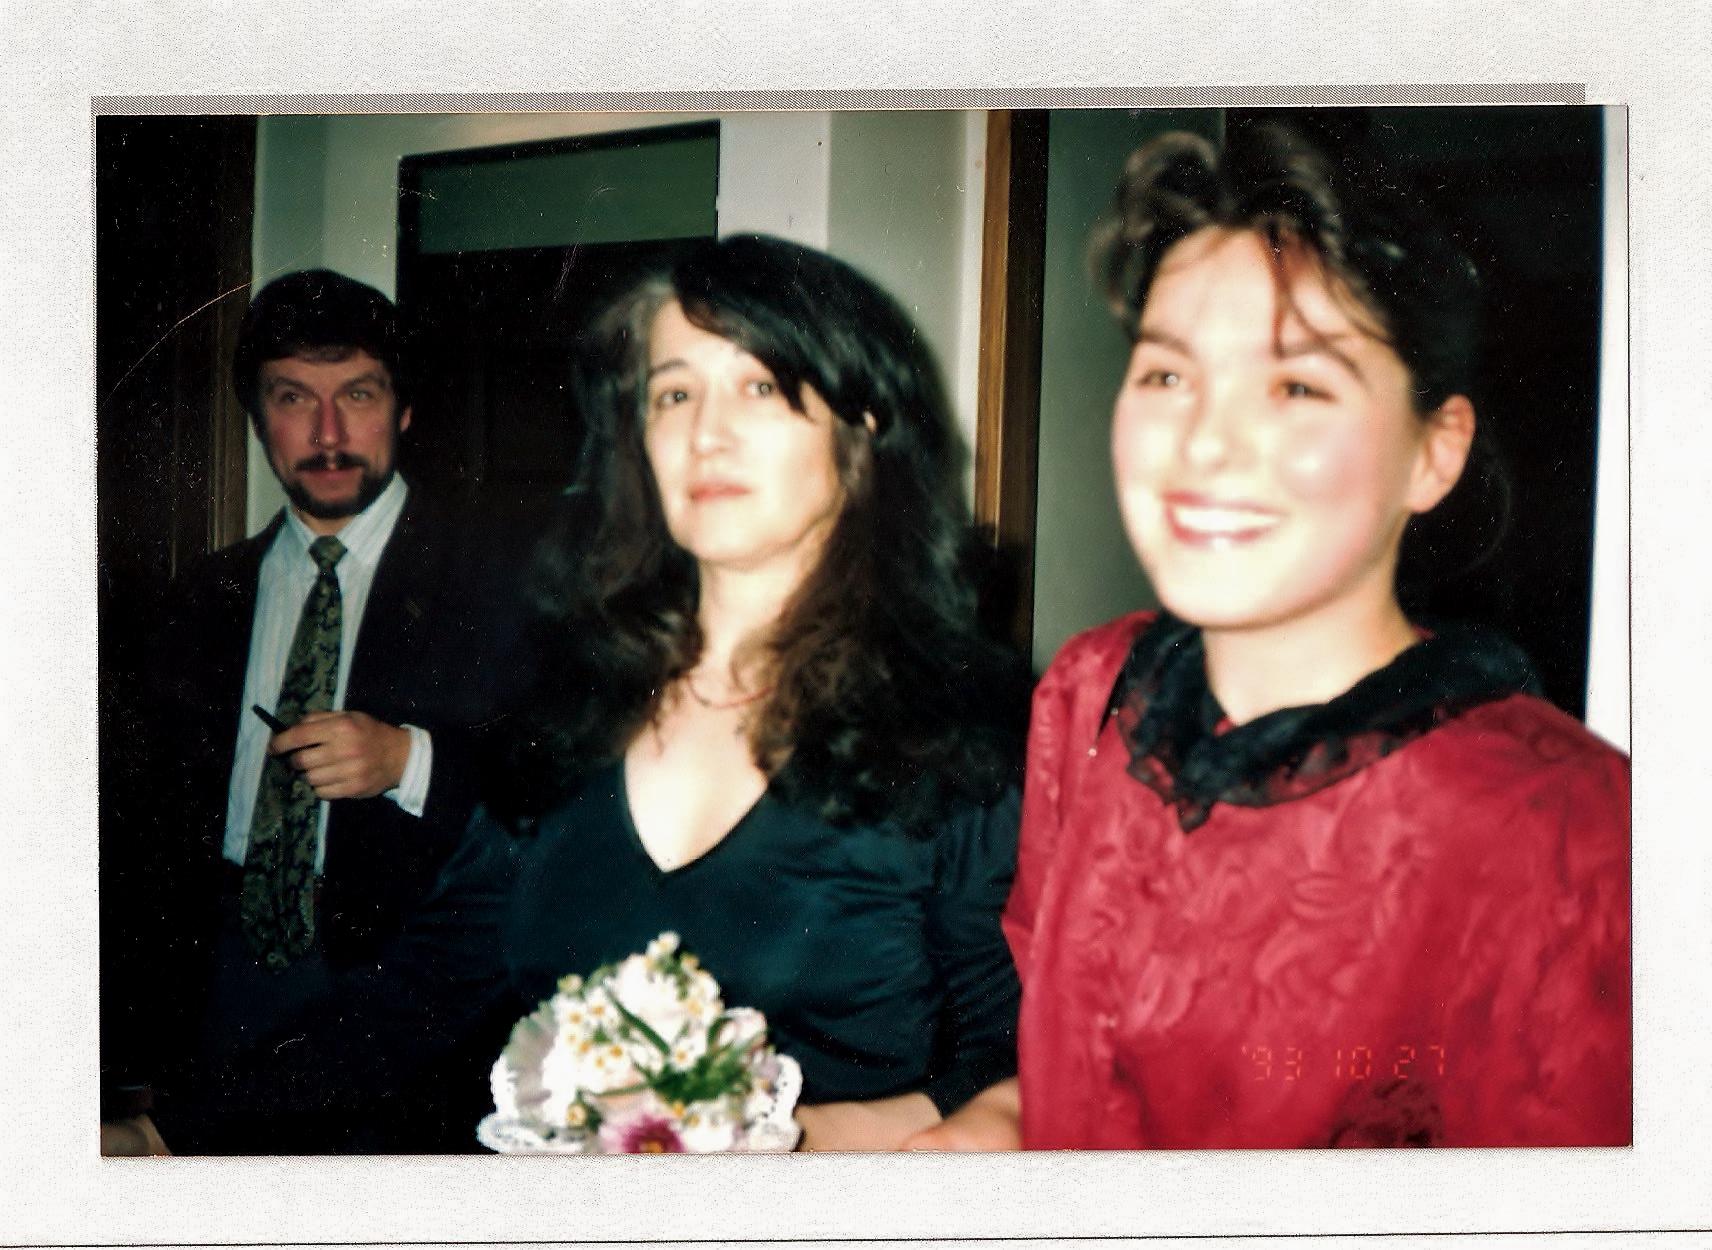 Vesna i Martha Argerich, Vienna